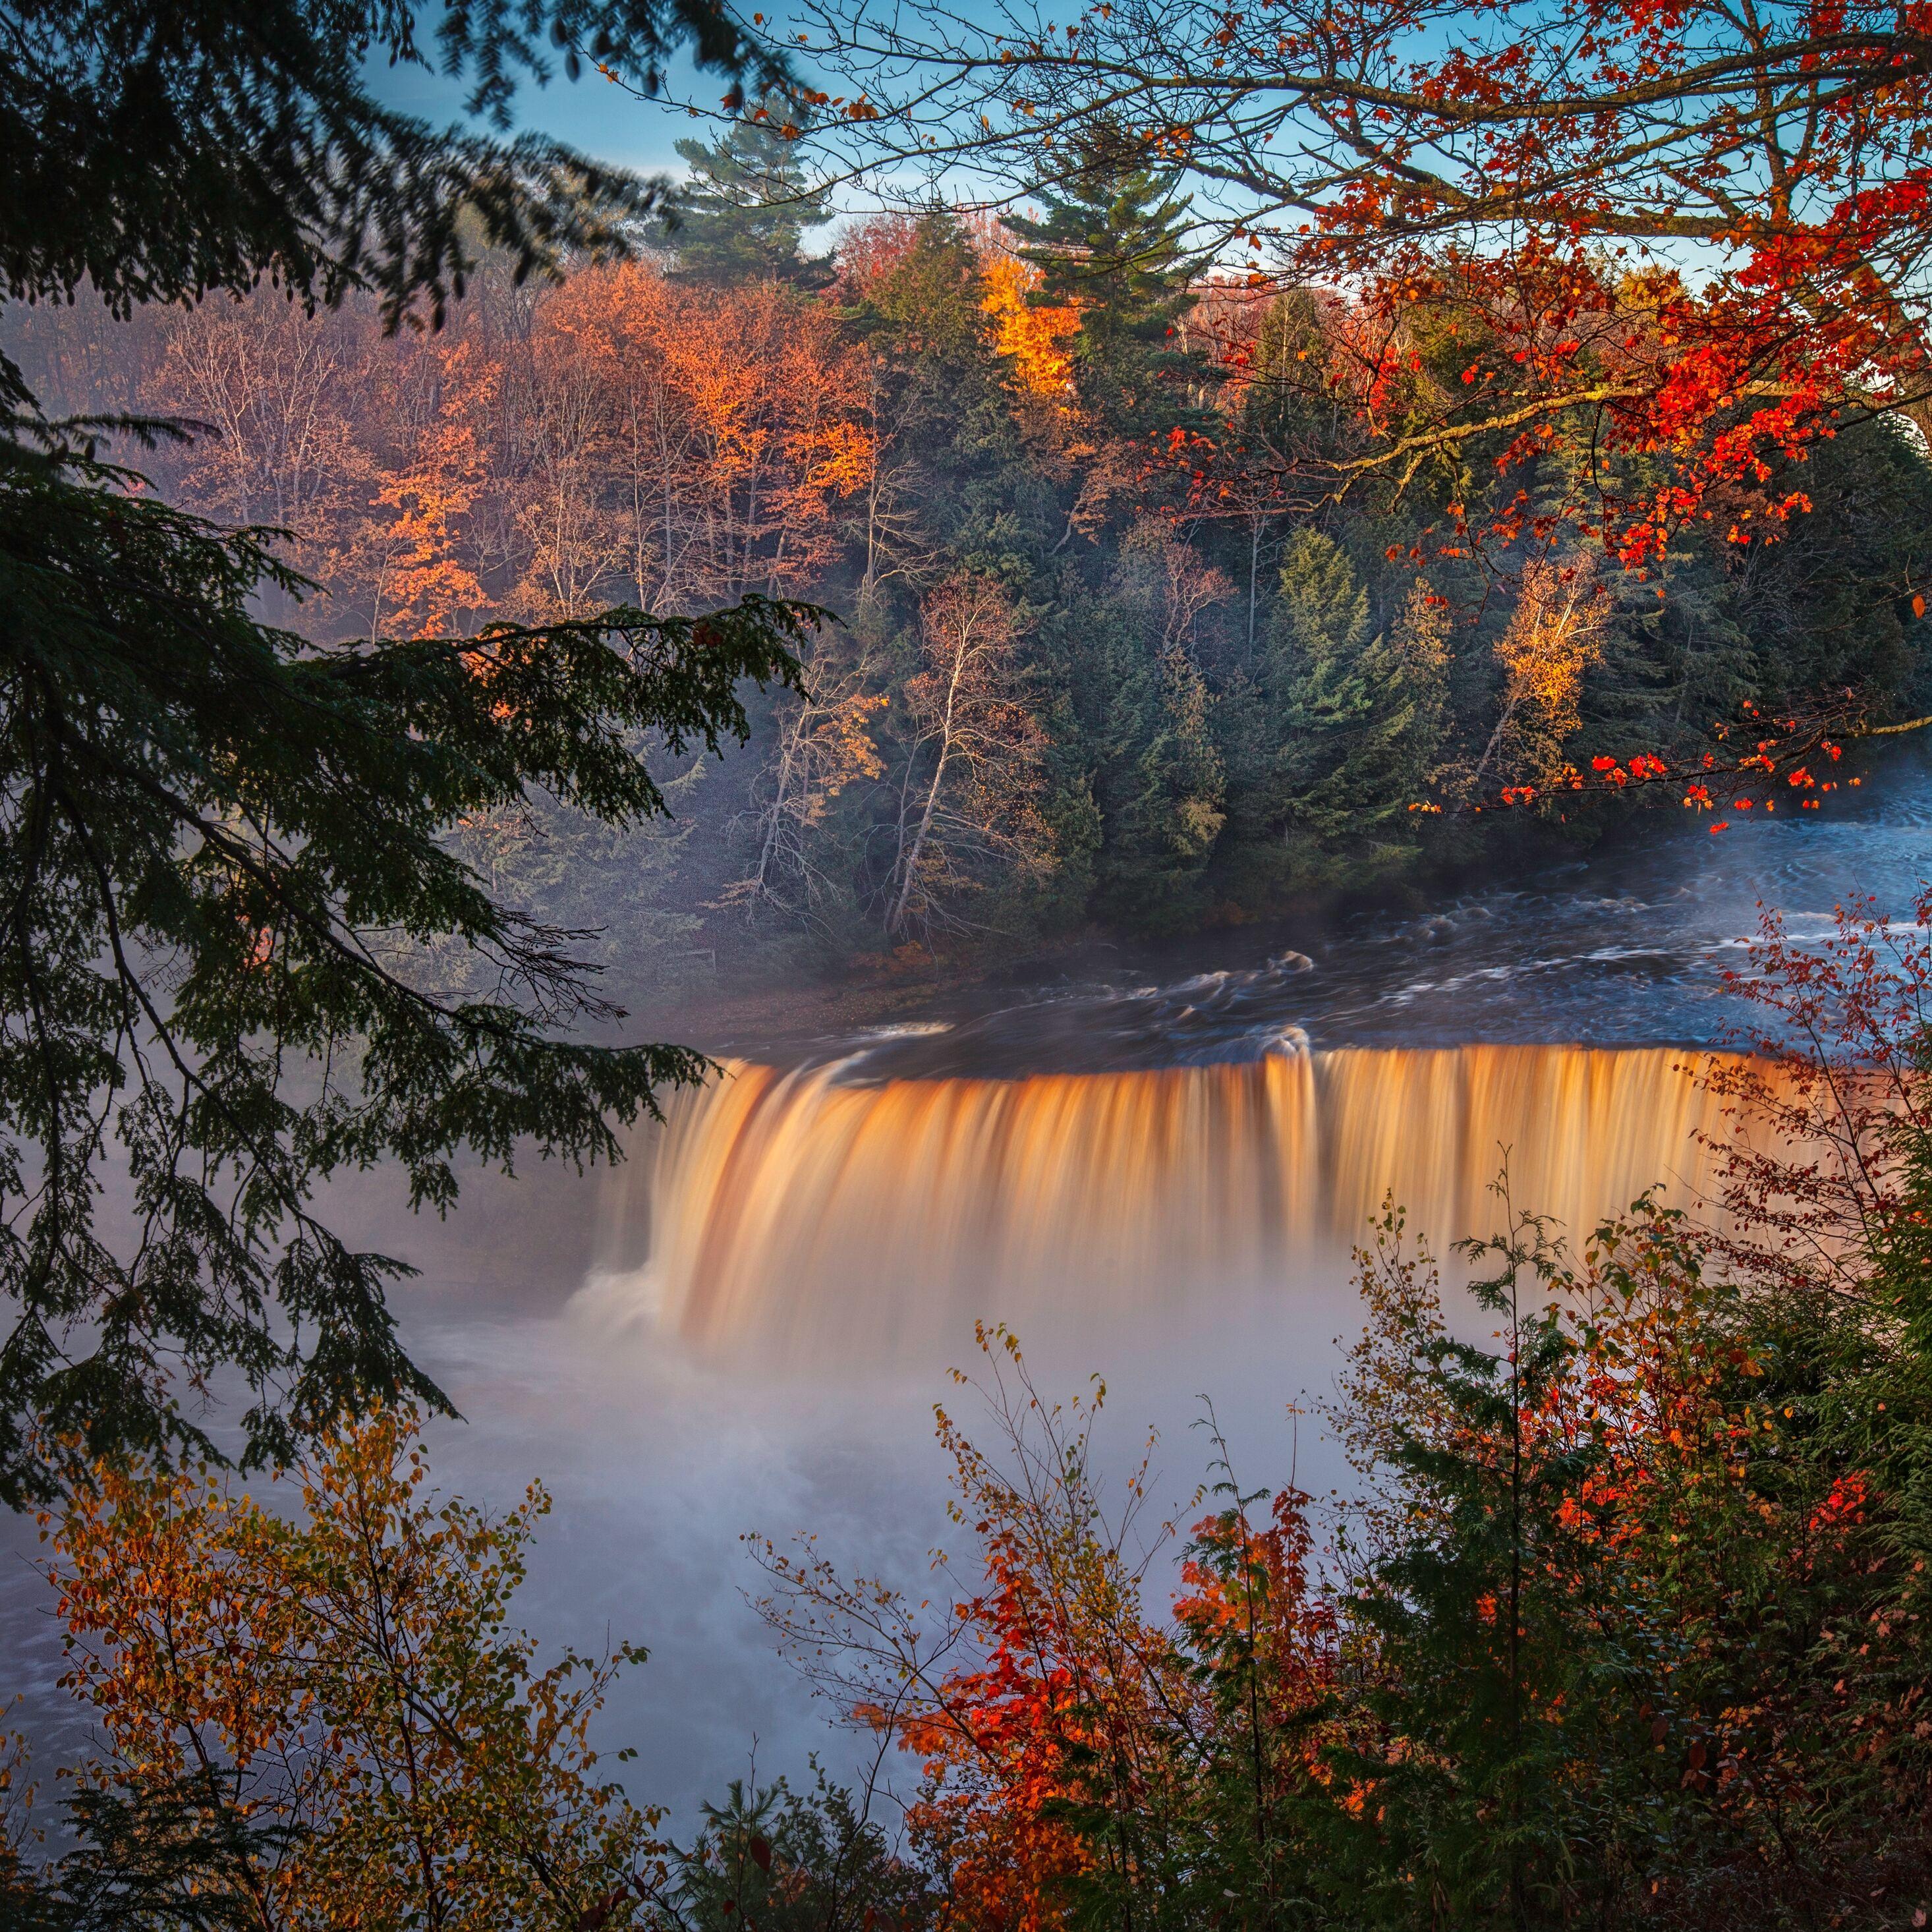 autumn-waterfall-forest-fall-5k-gu.jpg